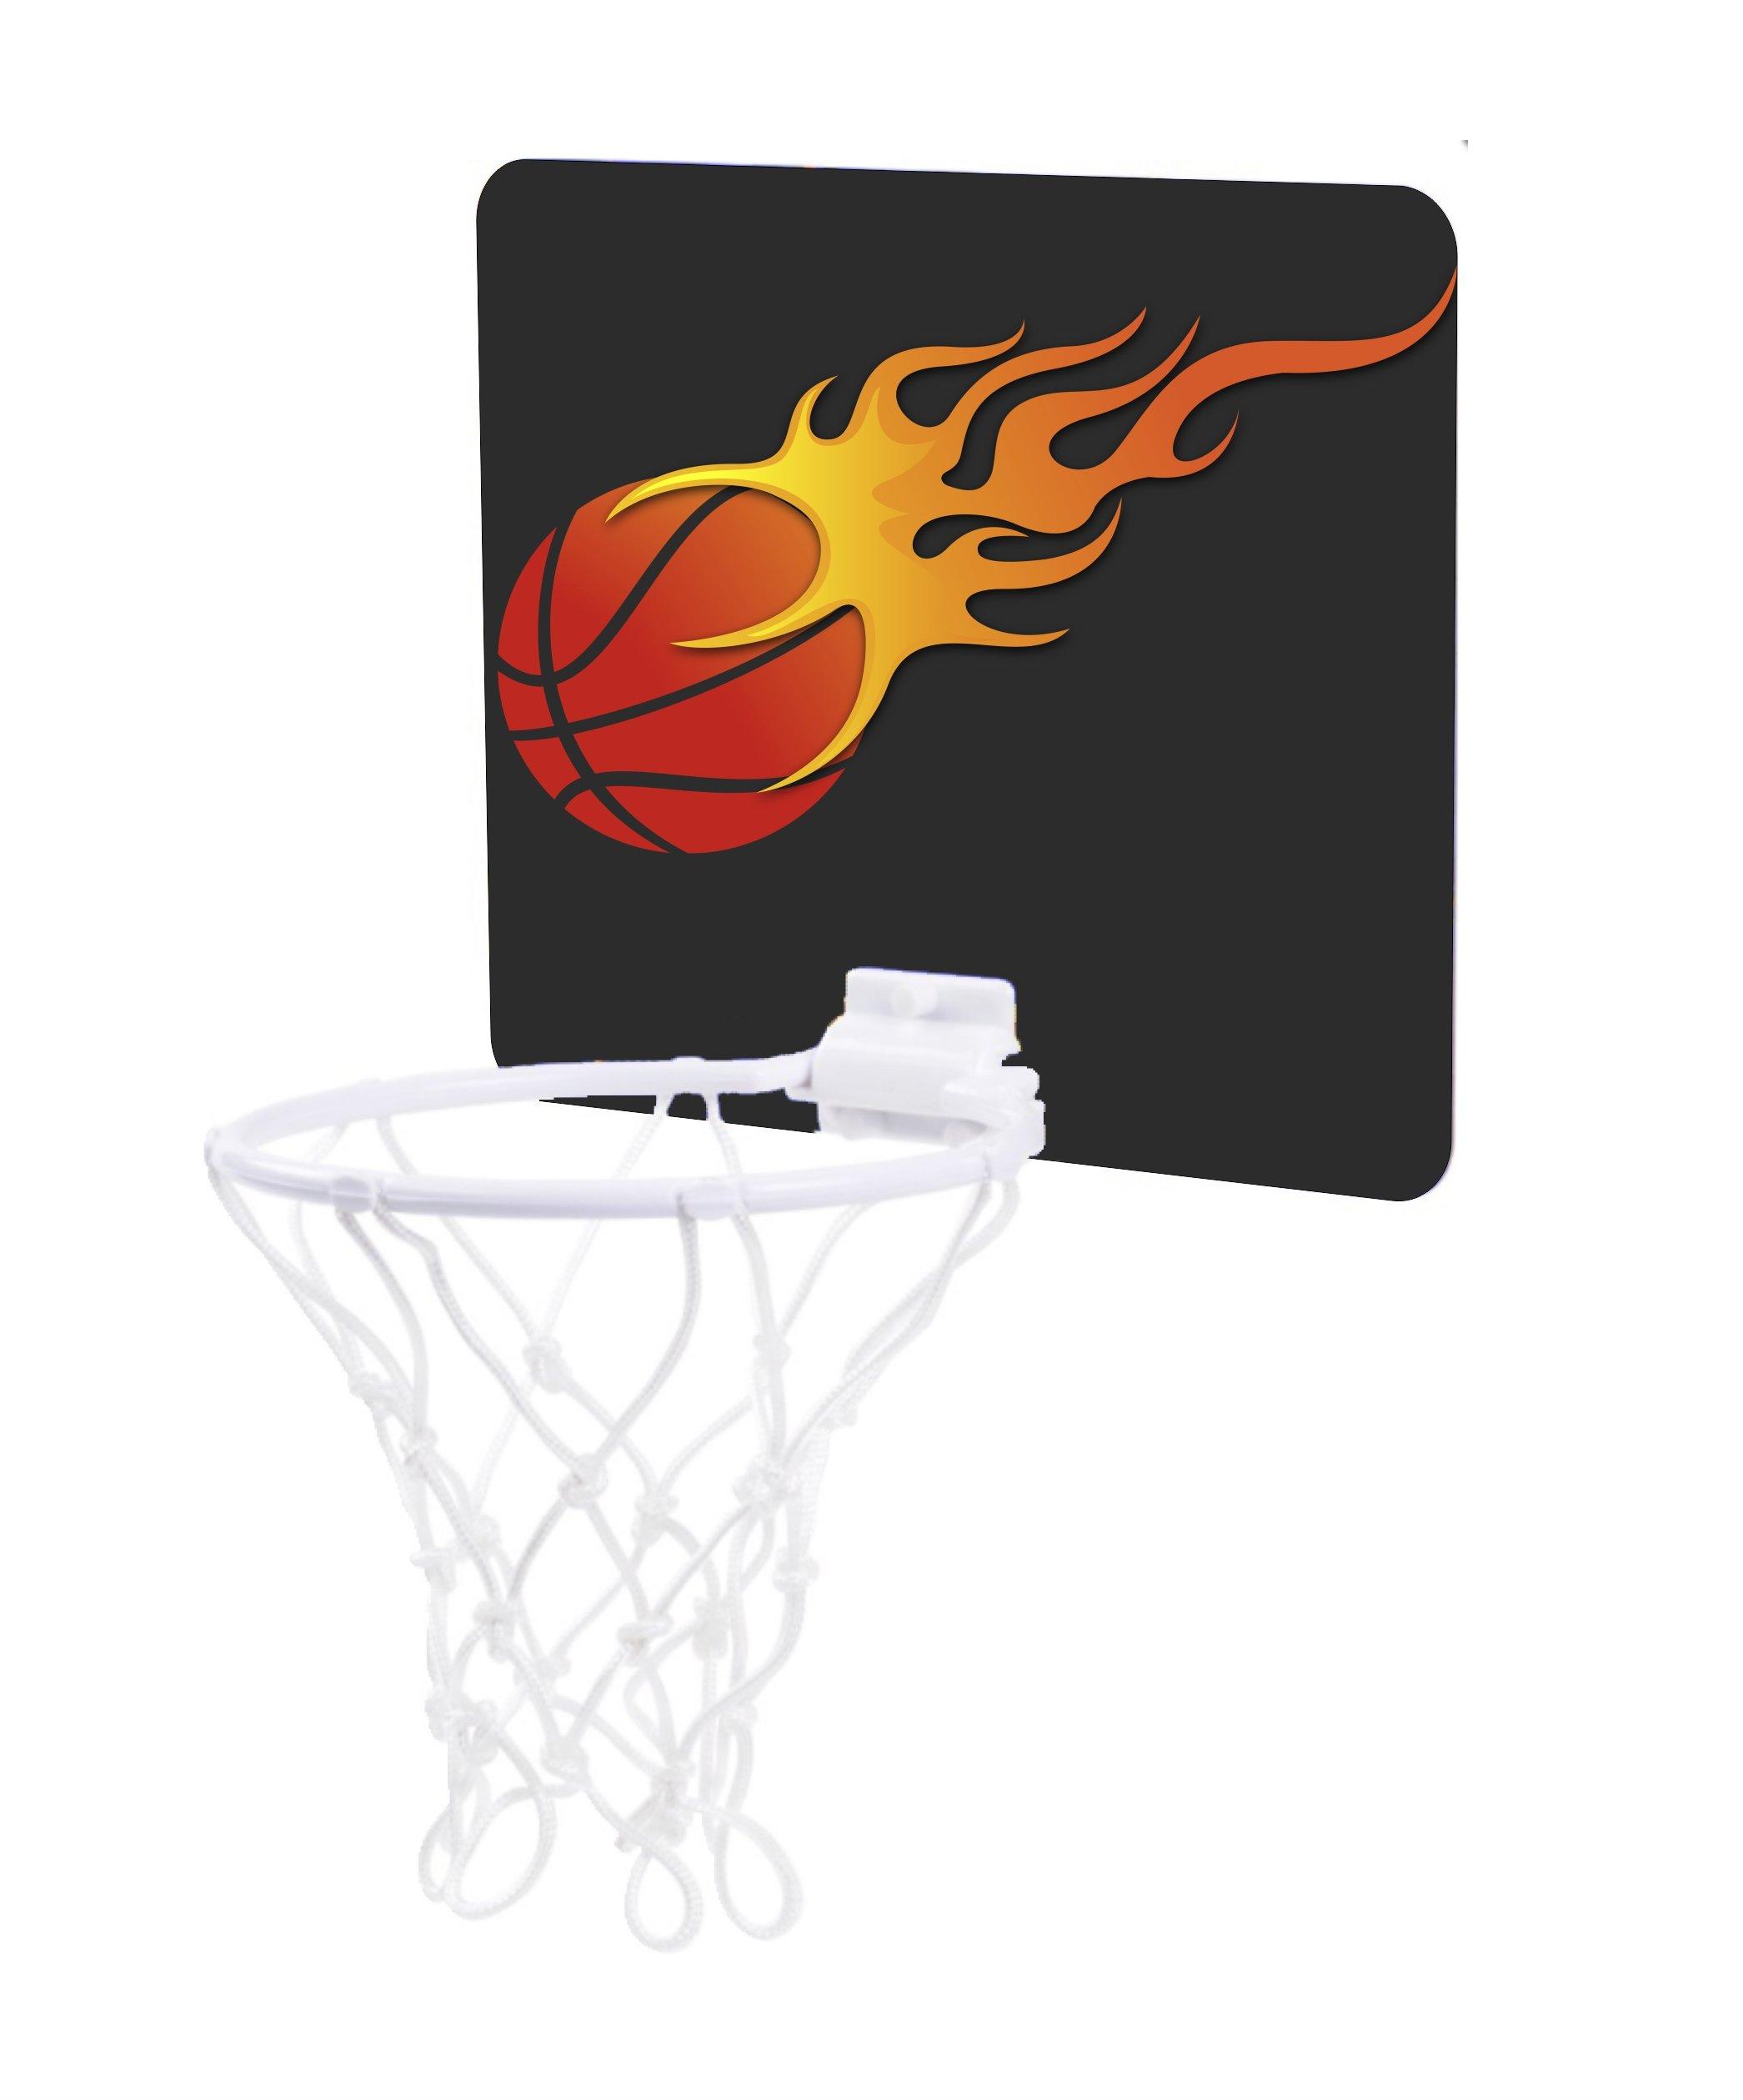 Jacks Outlet Flaming Basketball Design - Childrens 7.5'' x 9'' Mini Basketball Backboard - Goal with 6'' Hoop